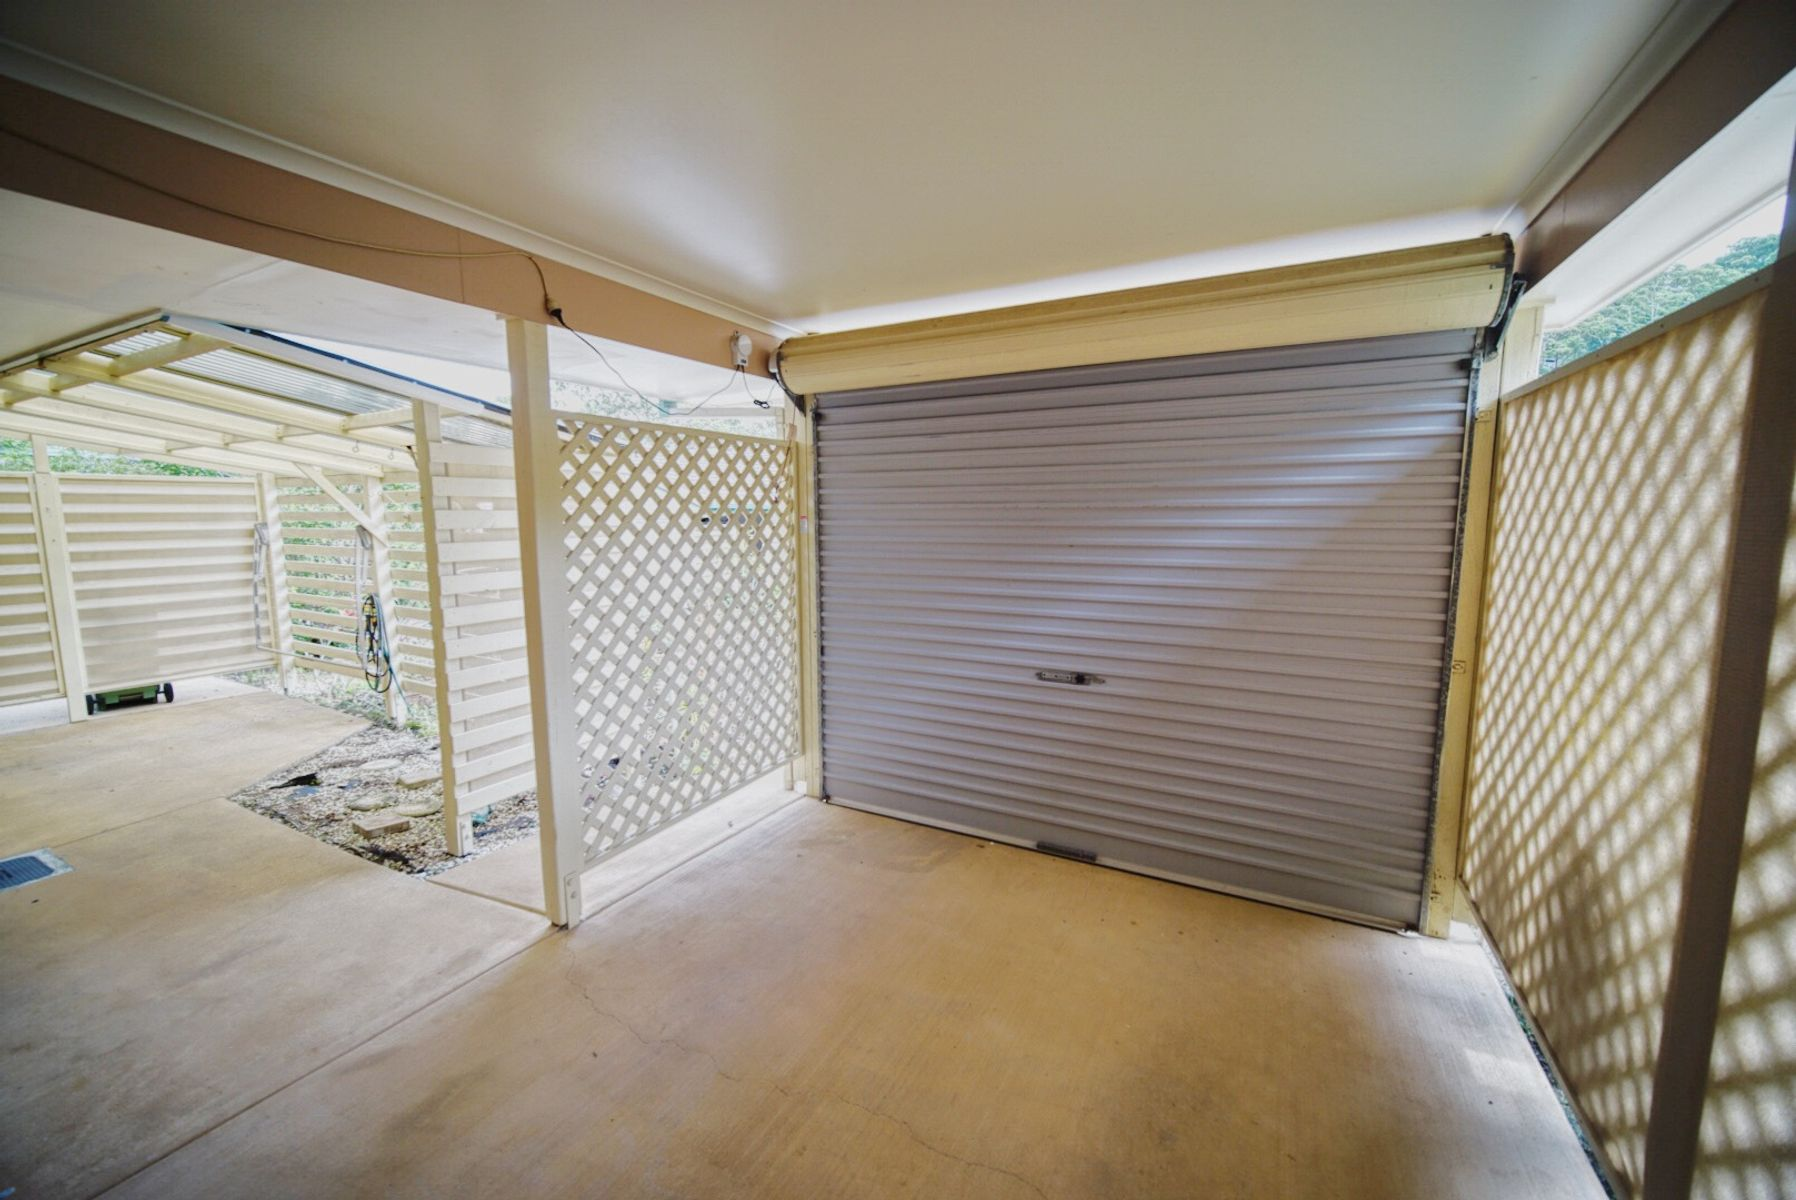 53/18 Doolan Street, Nambour, QLD 4560